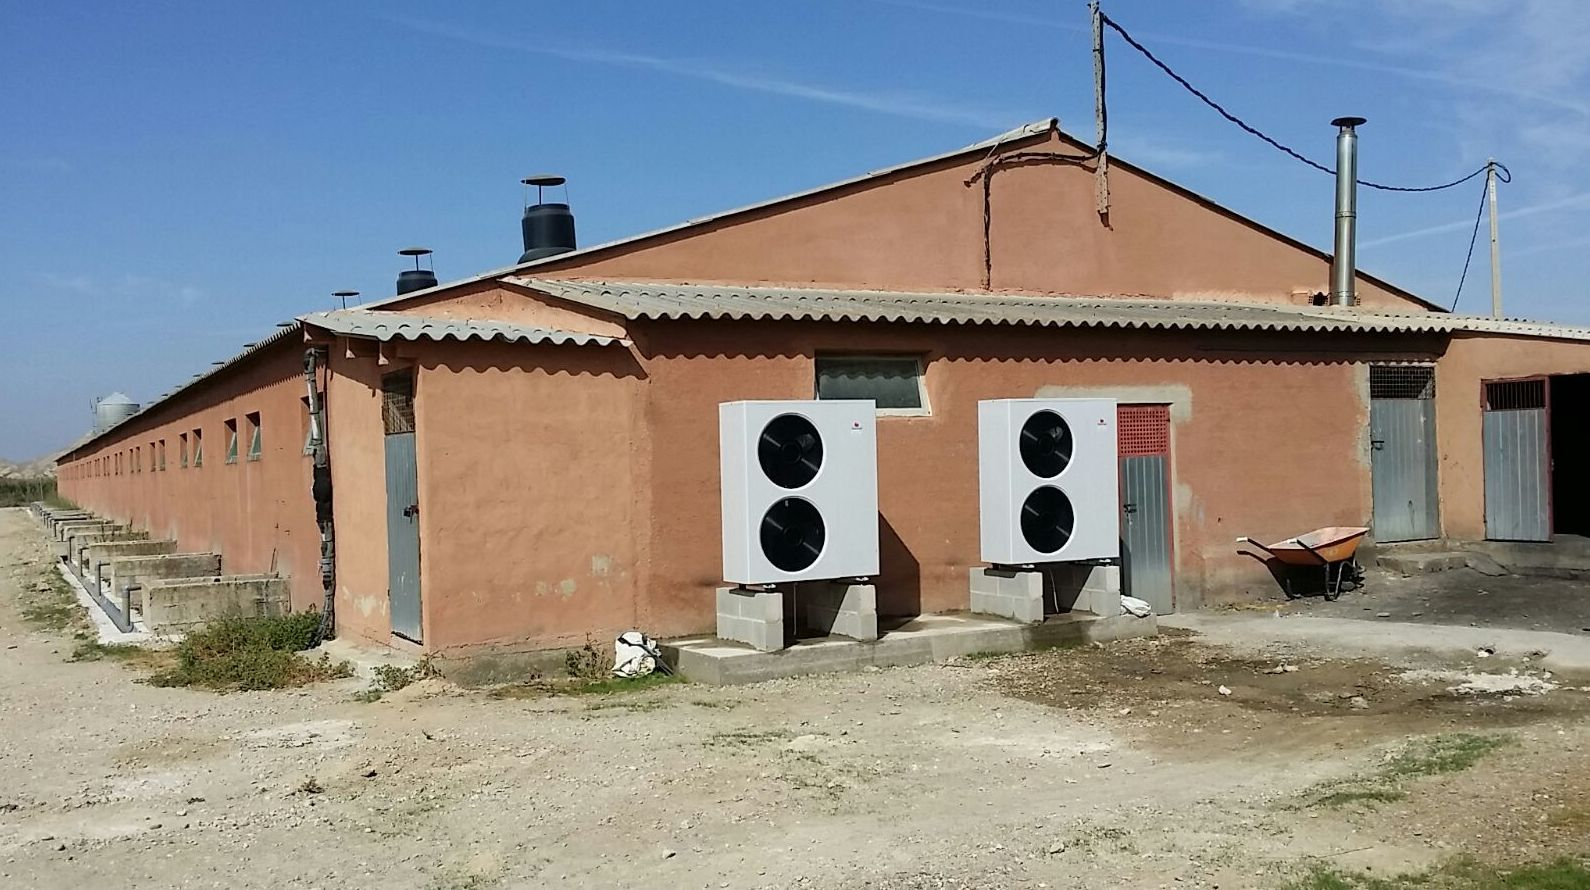 Energía renovable, sistema de aerotermia para producir agua caliente, calefacción y climatización en Granja Rada Zaragoza